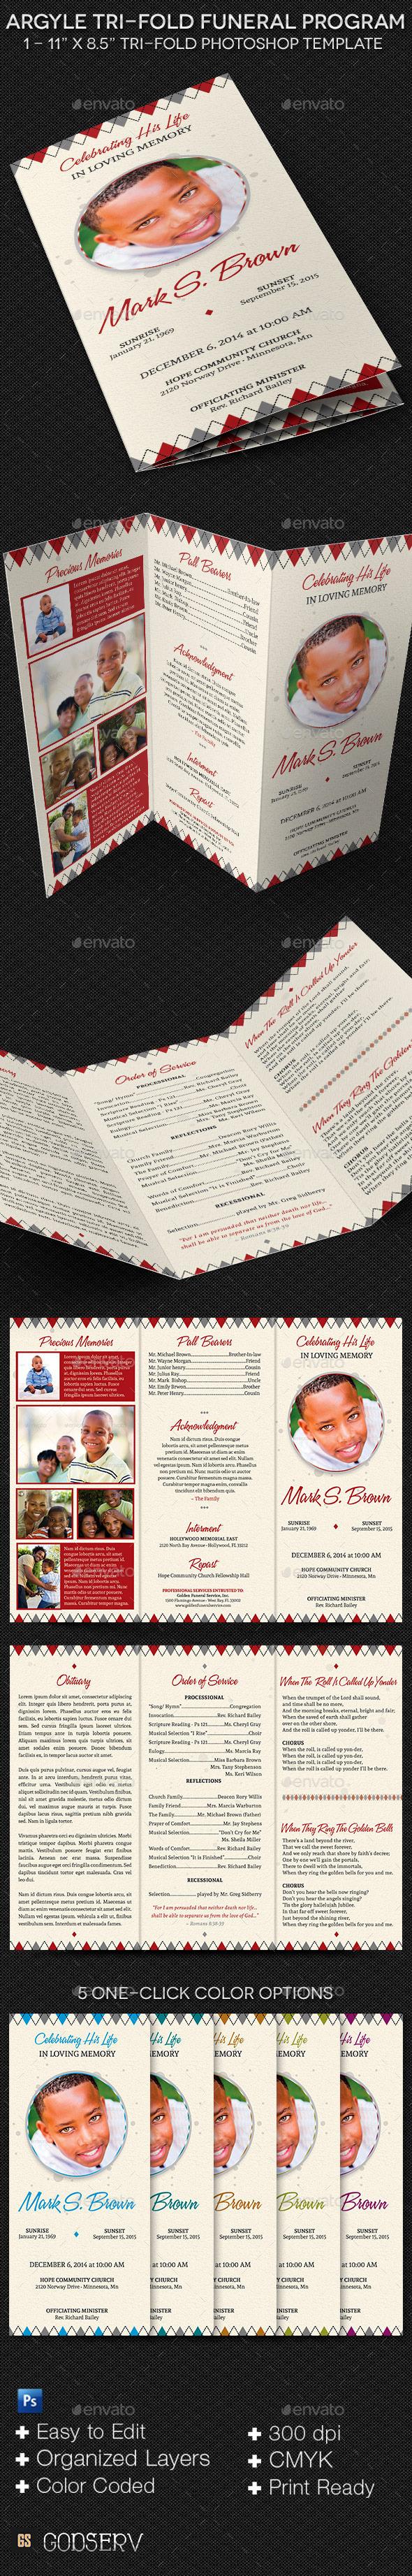 Argyle Tri-Fold Funeral Program Template - Informational Brochures